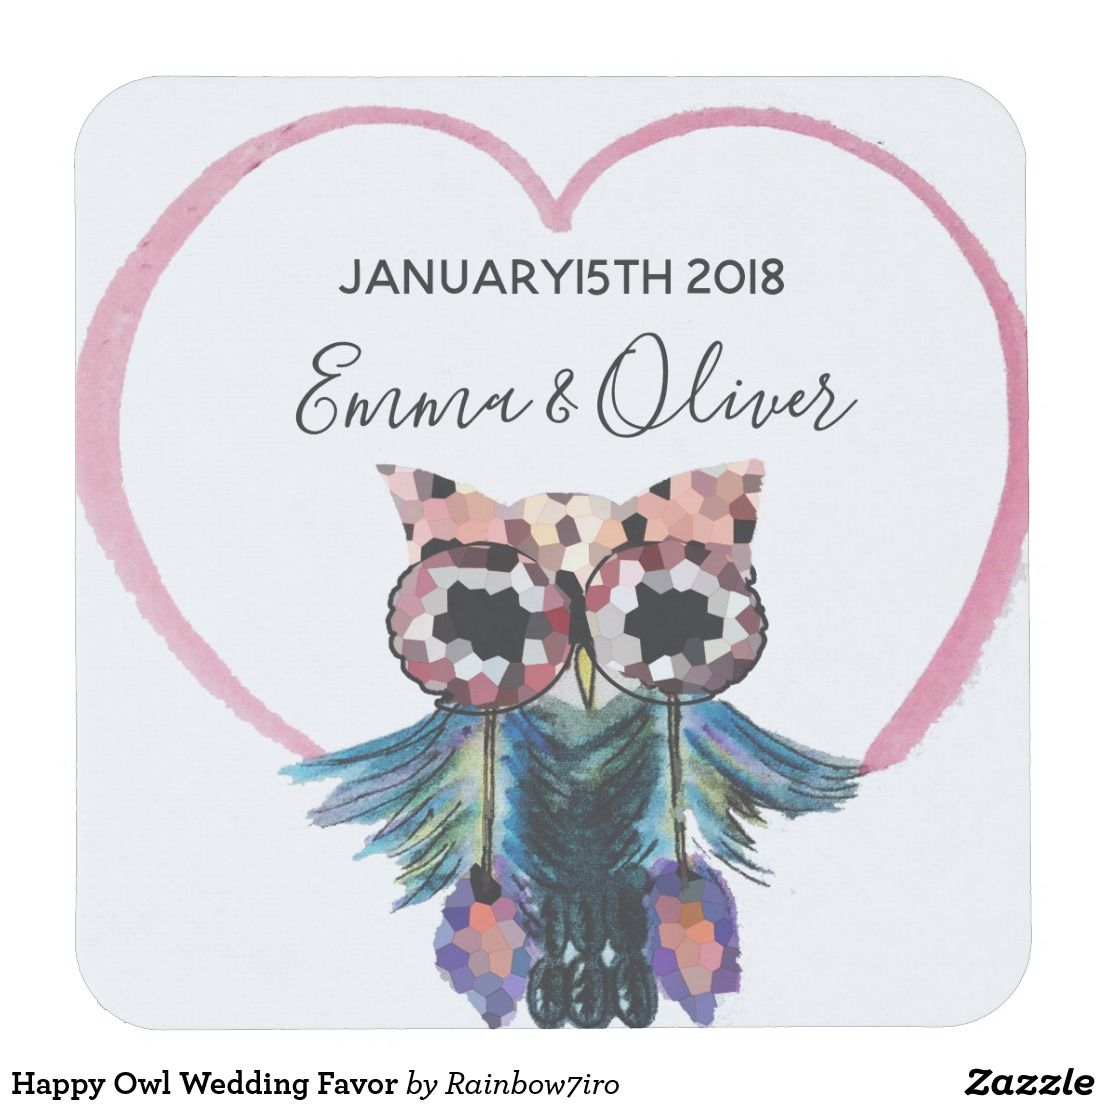 Happy Owl Wedding Favor Square Paper Coaster   Favors